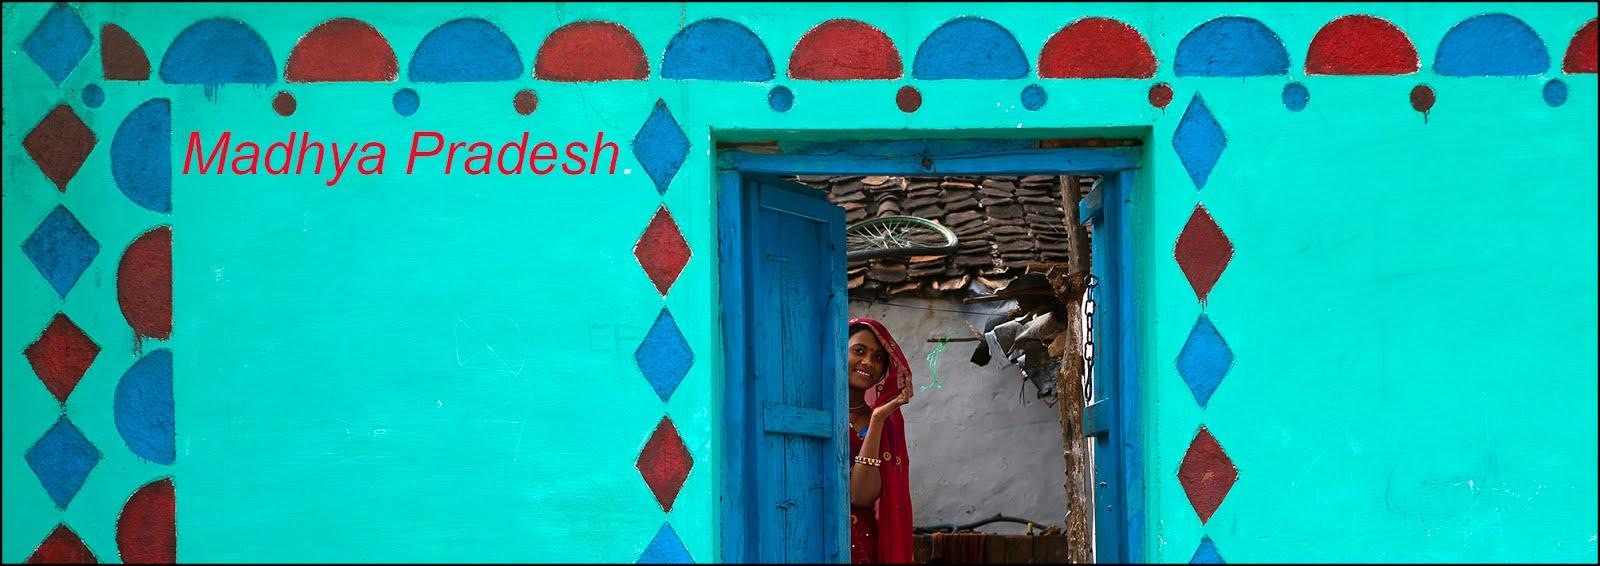 Madhya Pradesh.  मध्य प्रदेश